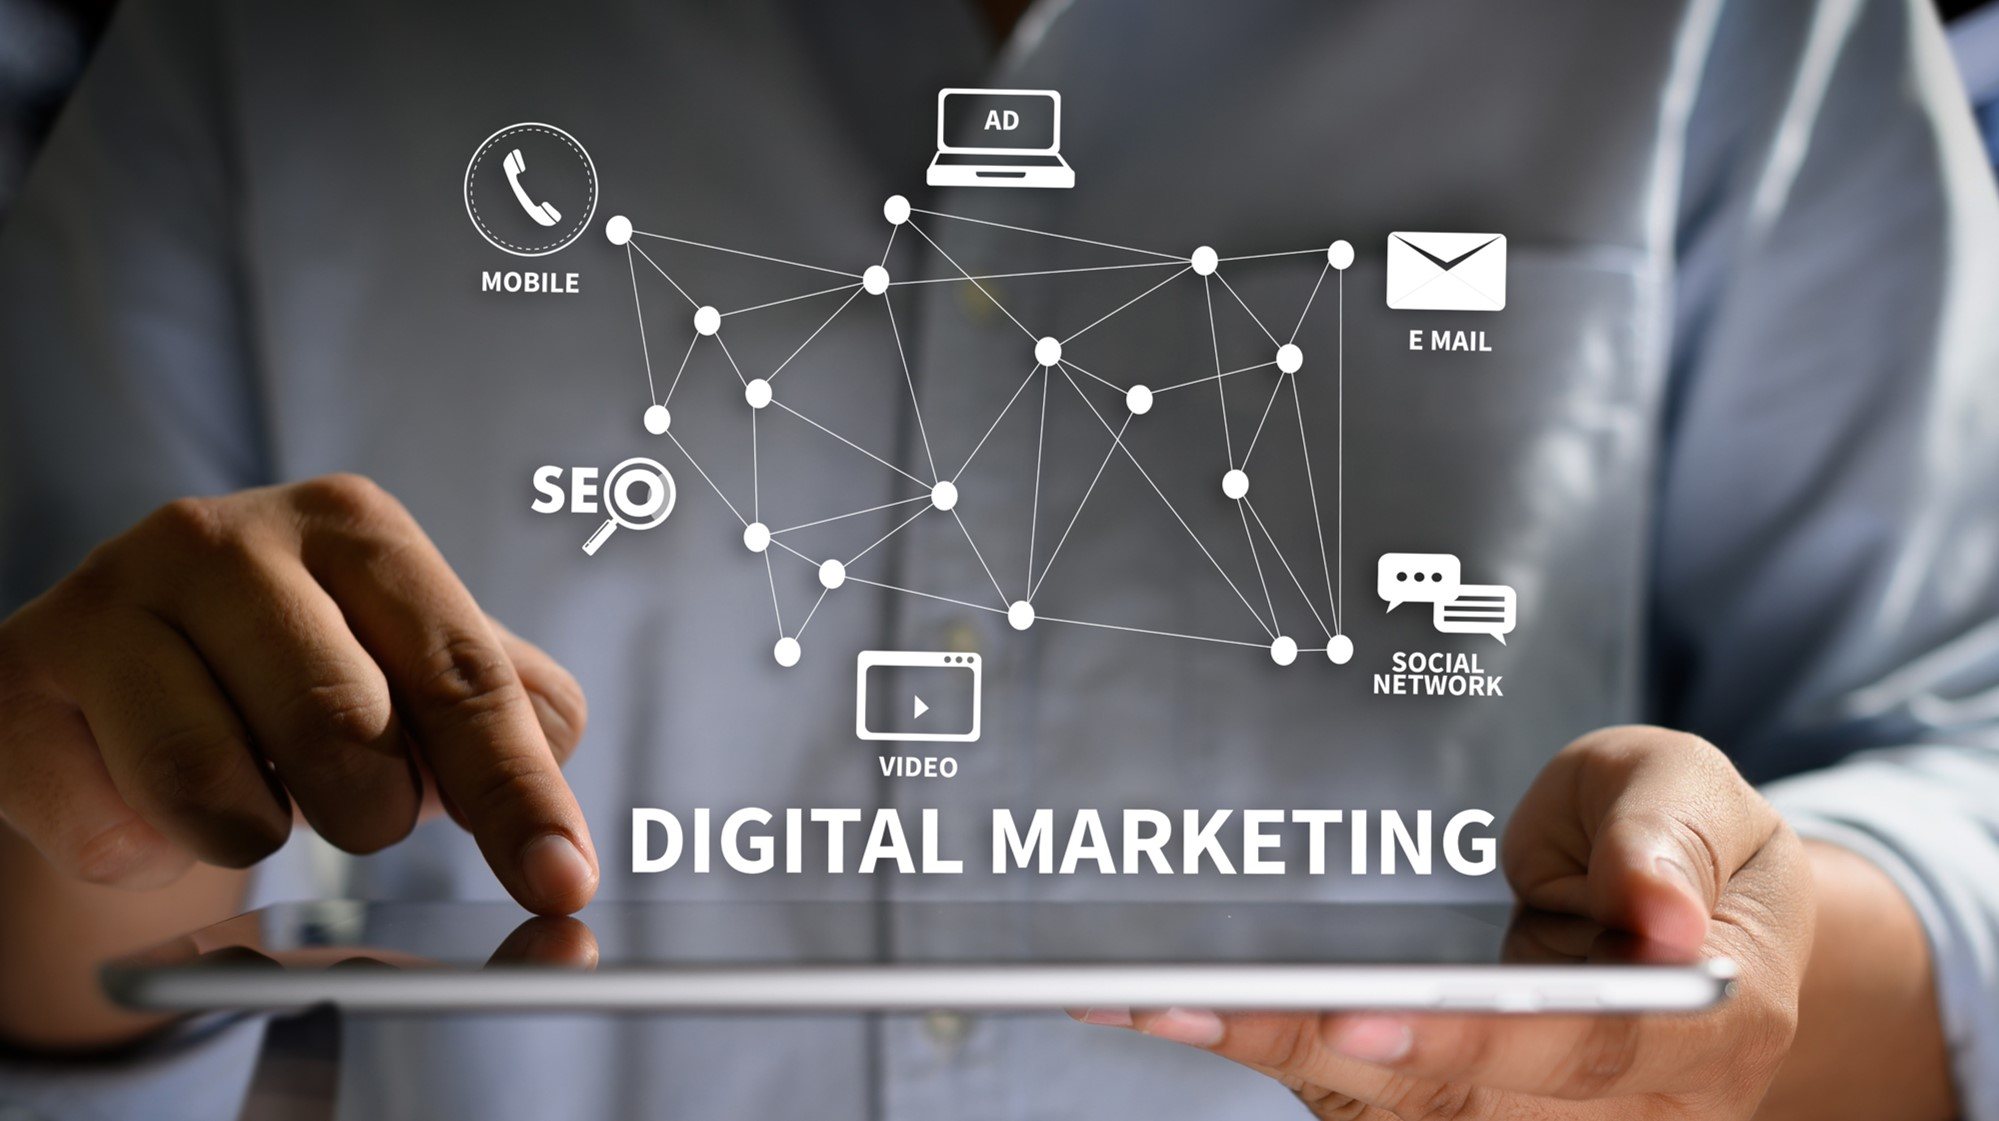 Digital Marketing - www.visualbreakthroughs.com